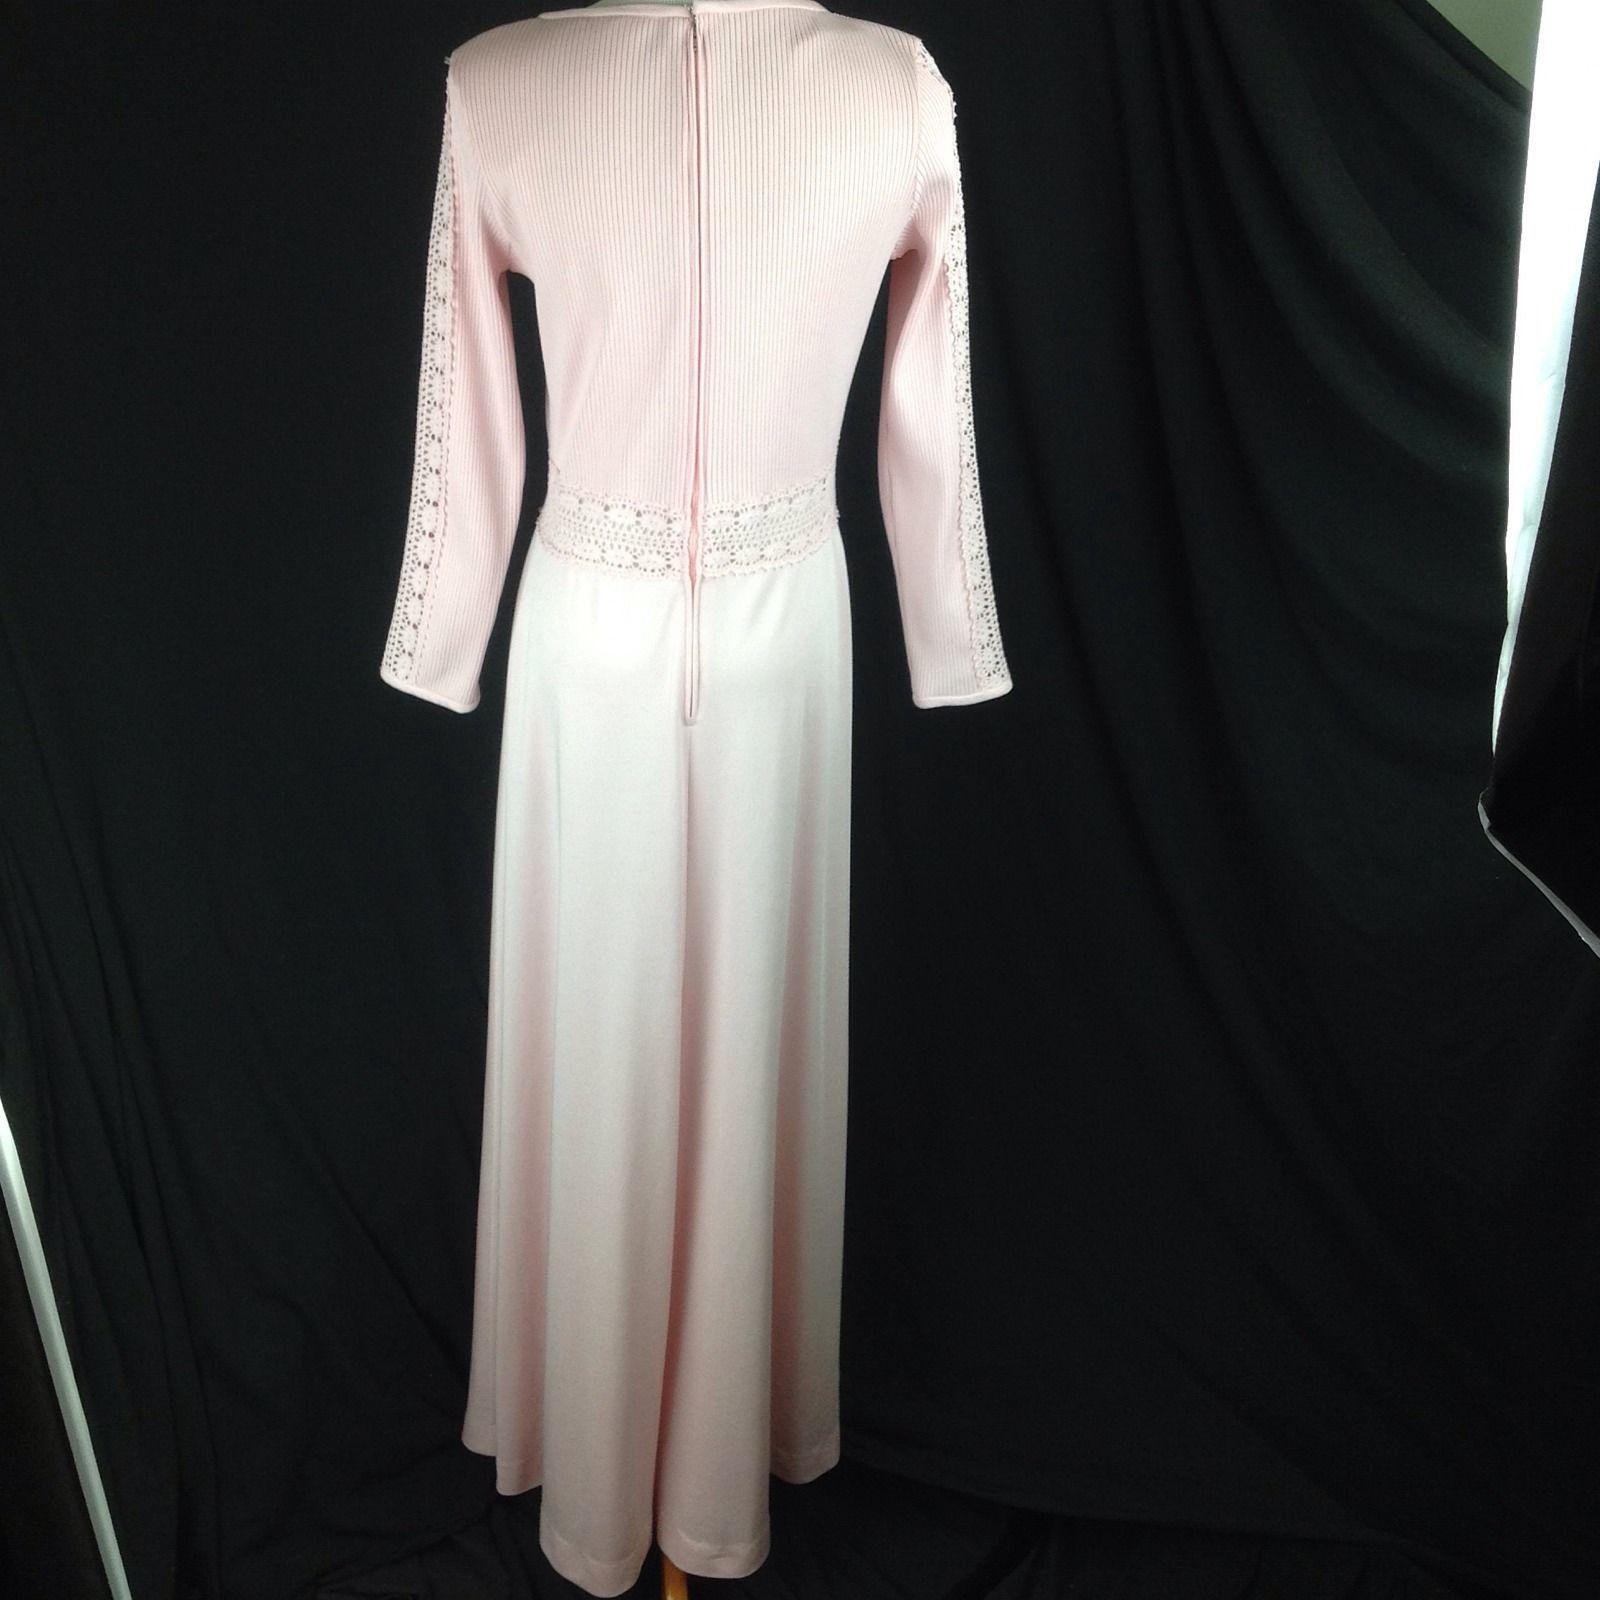 S Vtg Pink Crochet Peekaboo Waist Kiana Polyester Maxi Dress ILGWU Alison Ayres